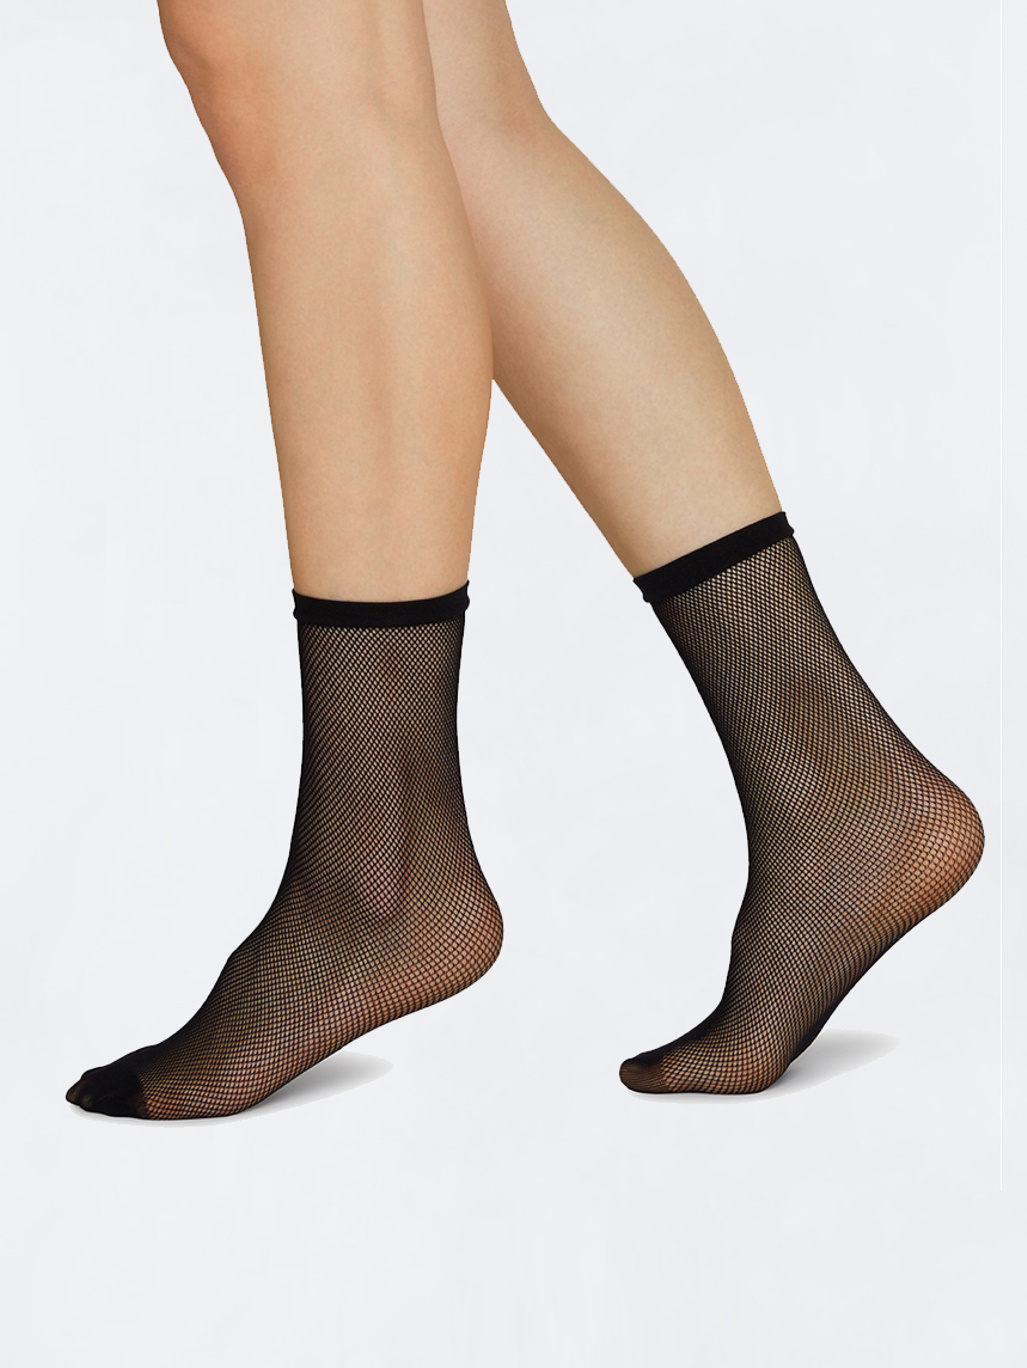 a1dff149e6b Elvira Net Socks Black - Swedish Stockings